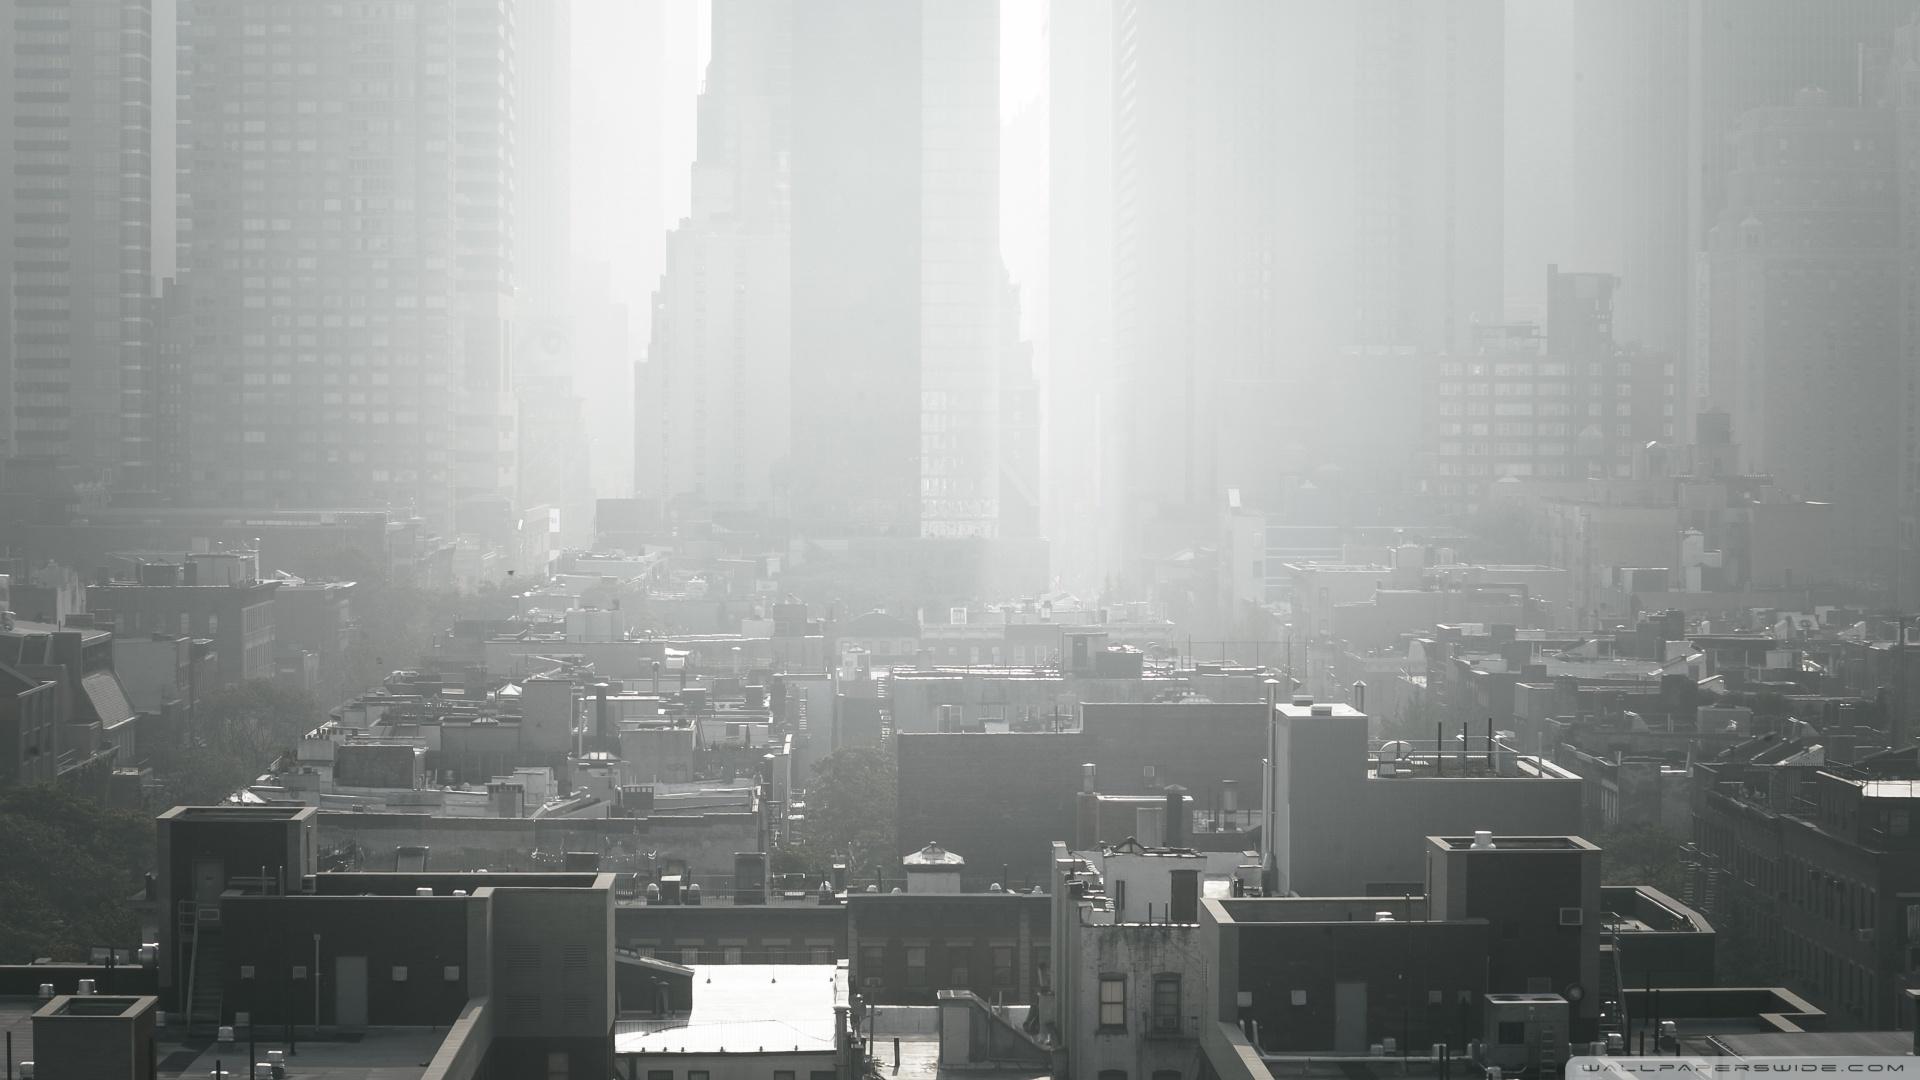 Hogwarts Wallpaper Hd New York City Smog 4k Hd Desktop Wallpaper For 4k Ultra Hd